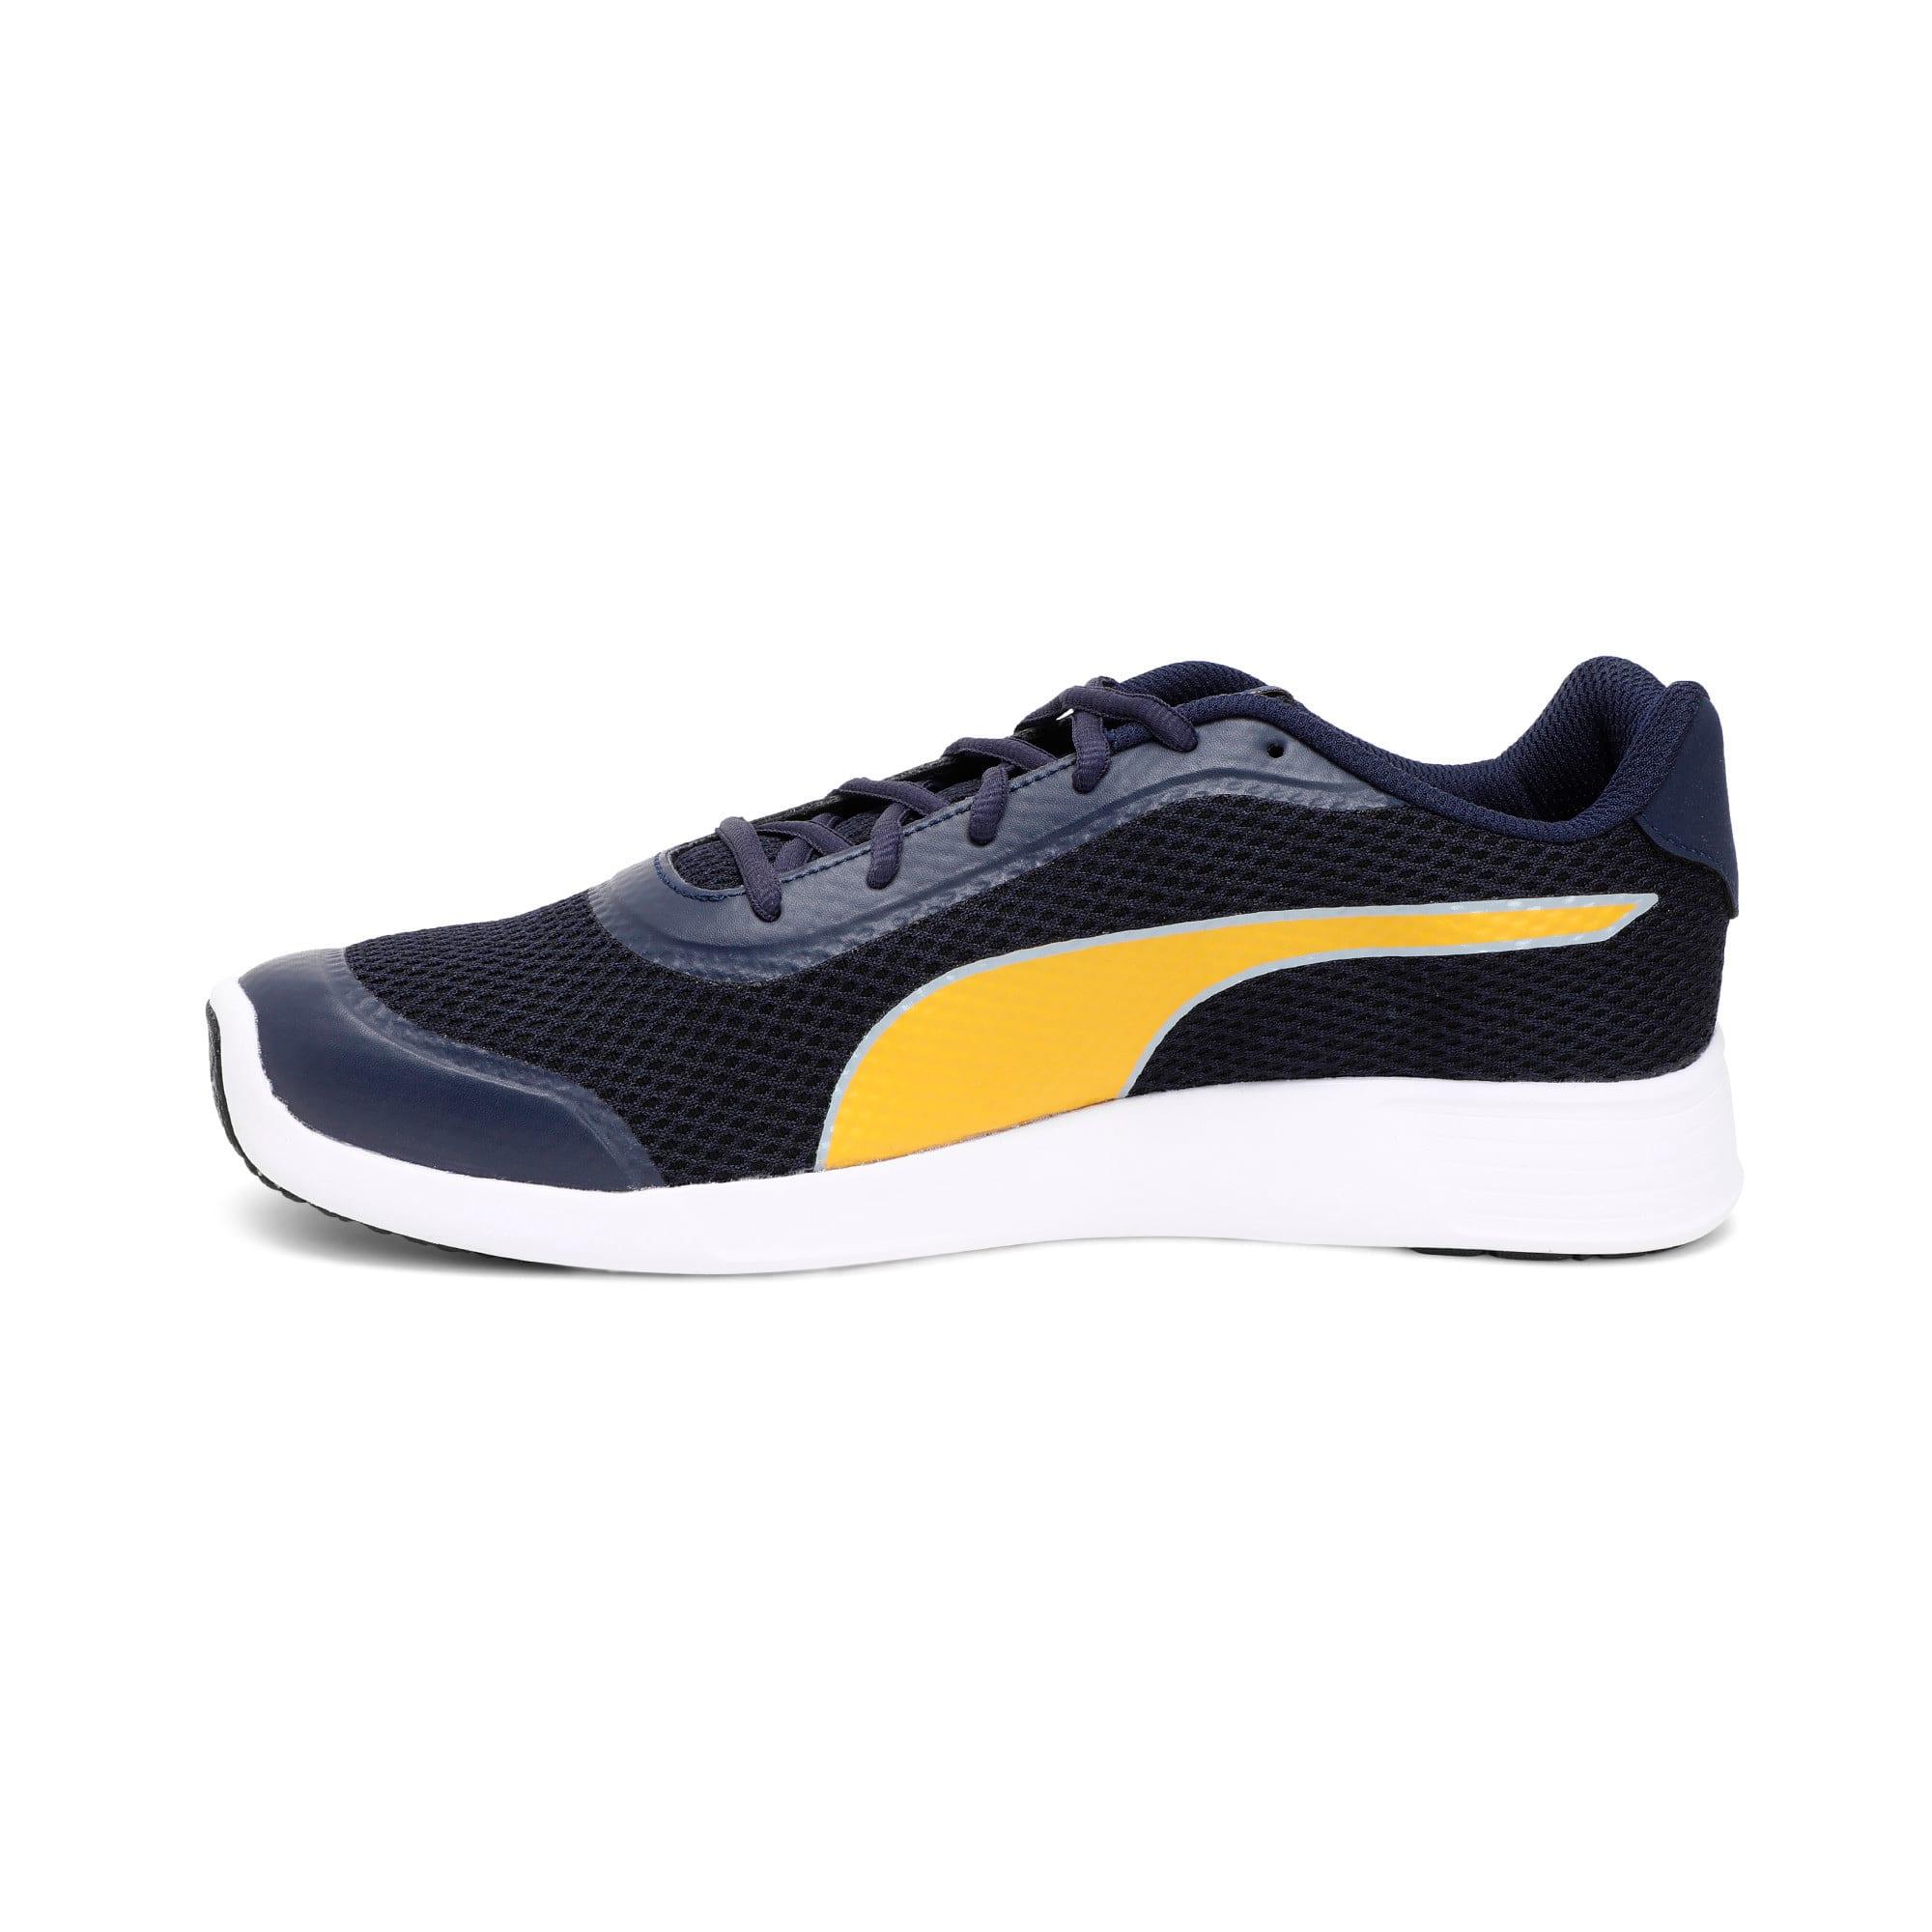 Thumbnail 1 of FST Runner v2 IDP Men's Sportstyle Shoes, Dark Shadow-Silver-Quarry, medium-IND